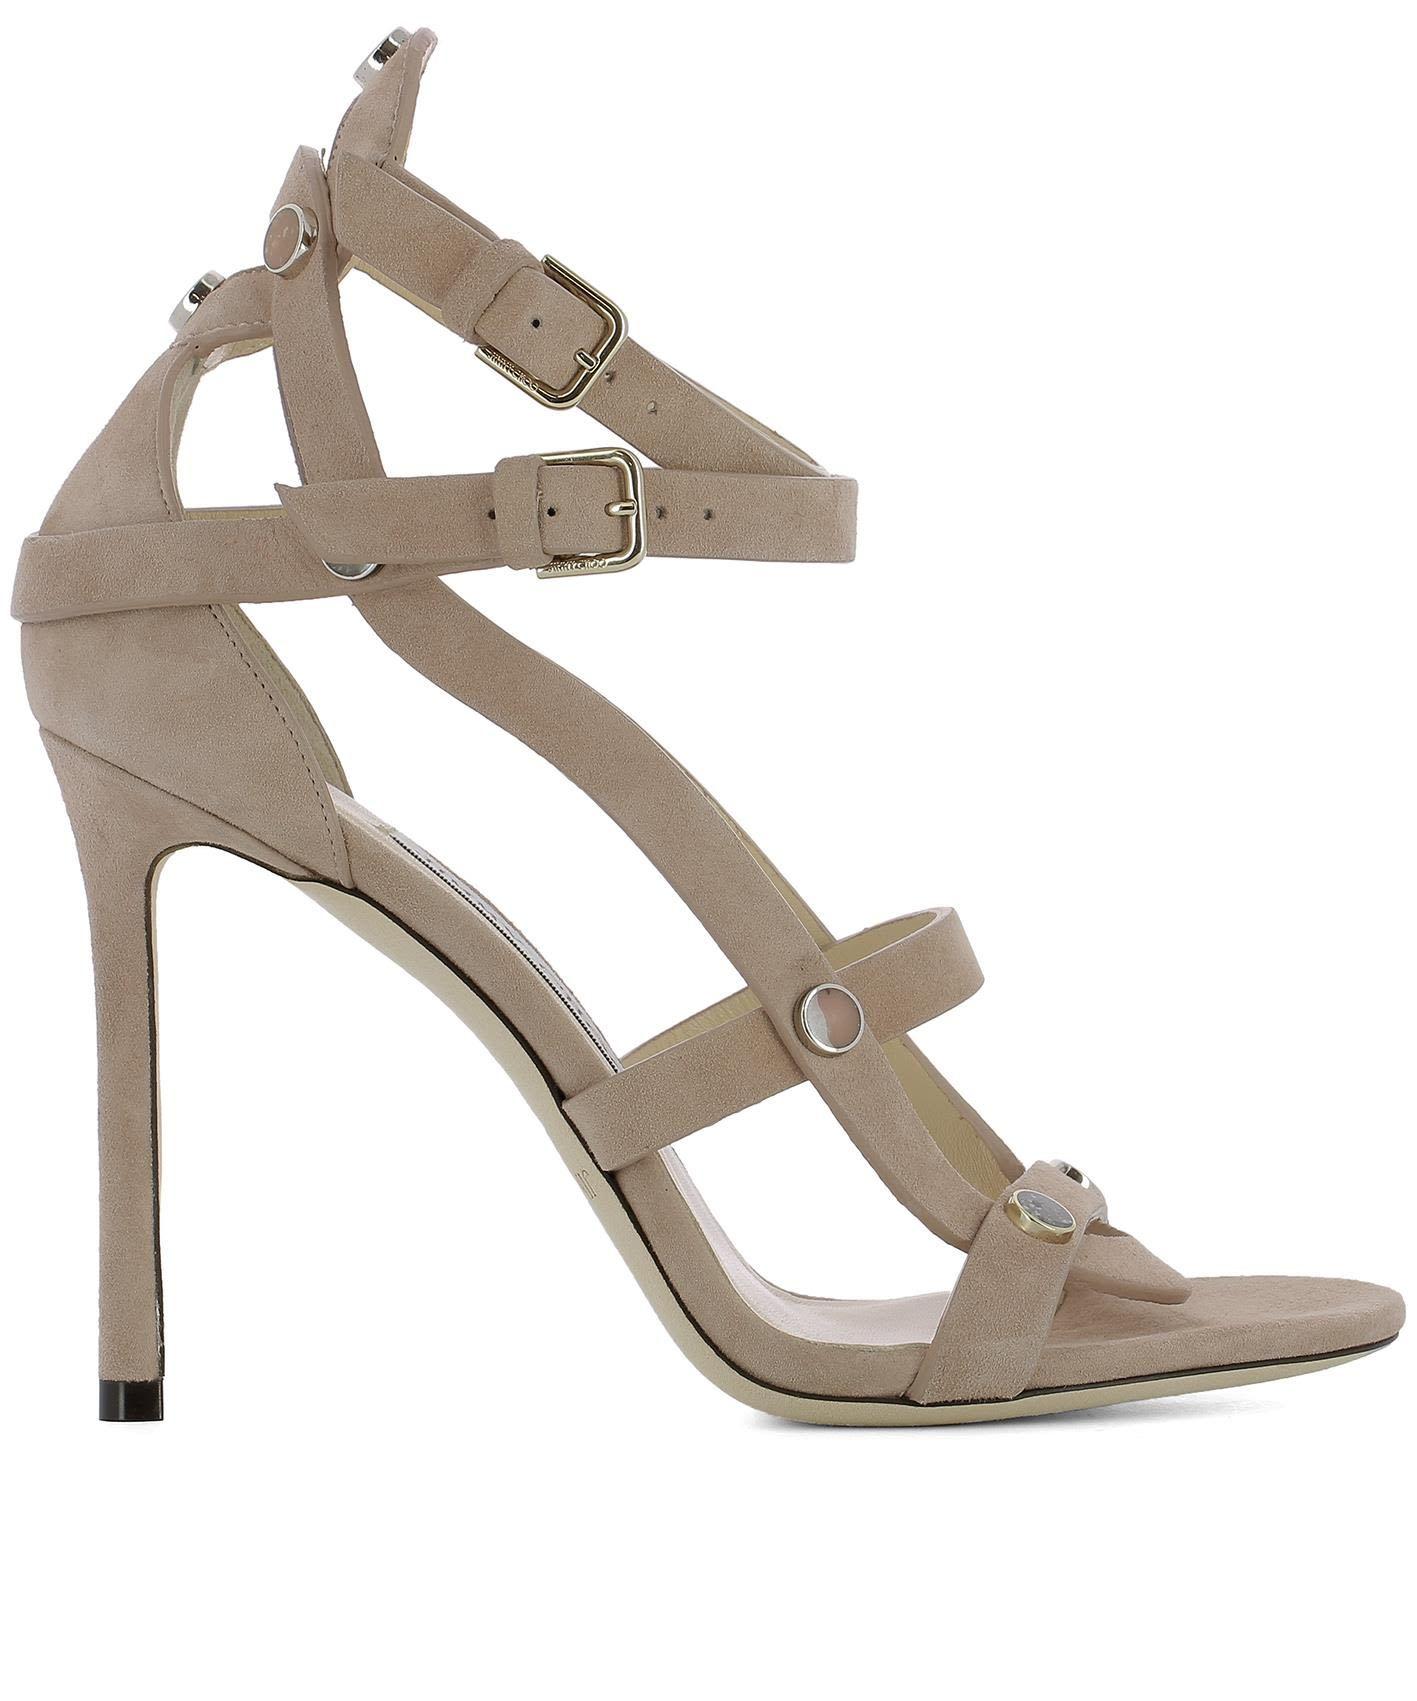 1ff11d0955d45 JIMMY CHOO | Jimmy Choo Pink Suede Motoko 100 Sandals #Shoes #High-heeled  shoes #JIMMY CHOO